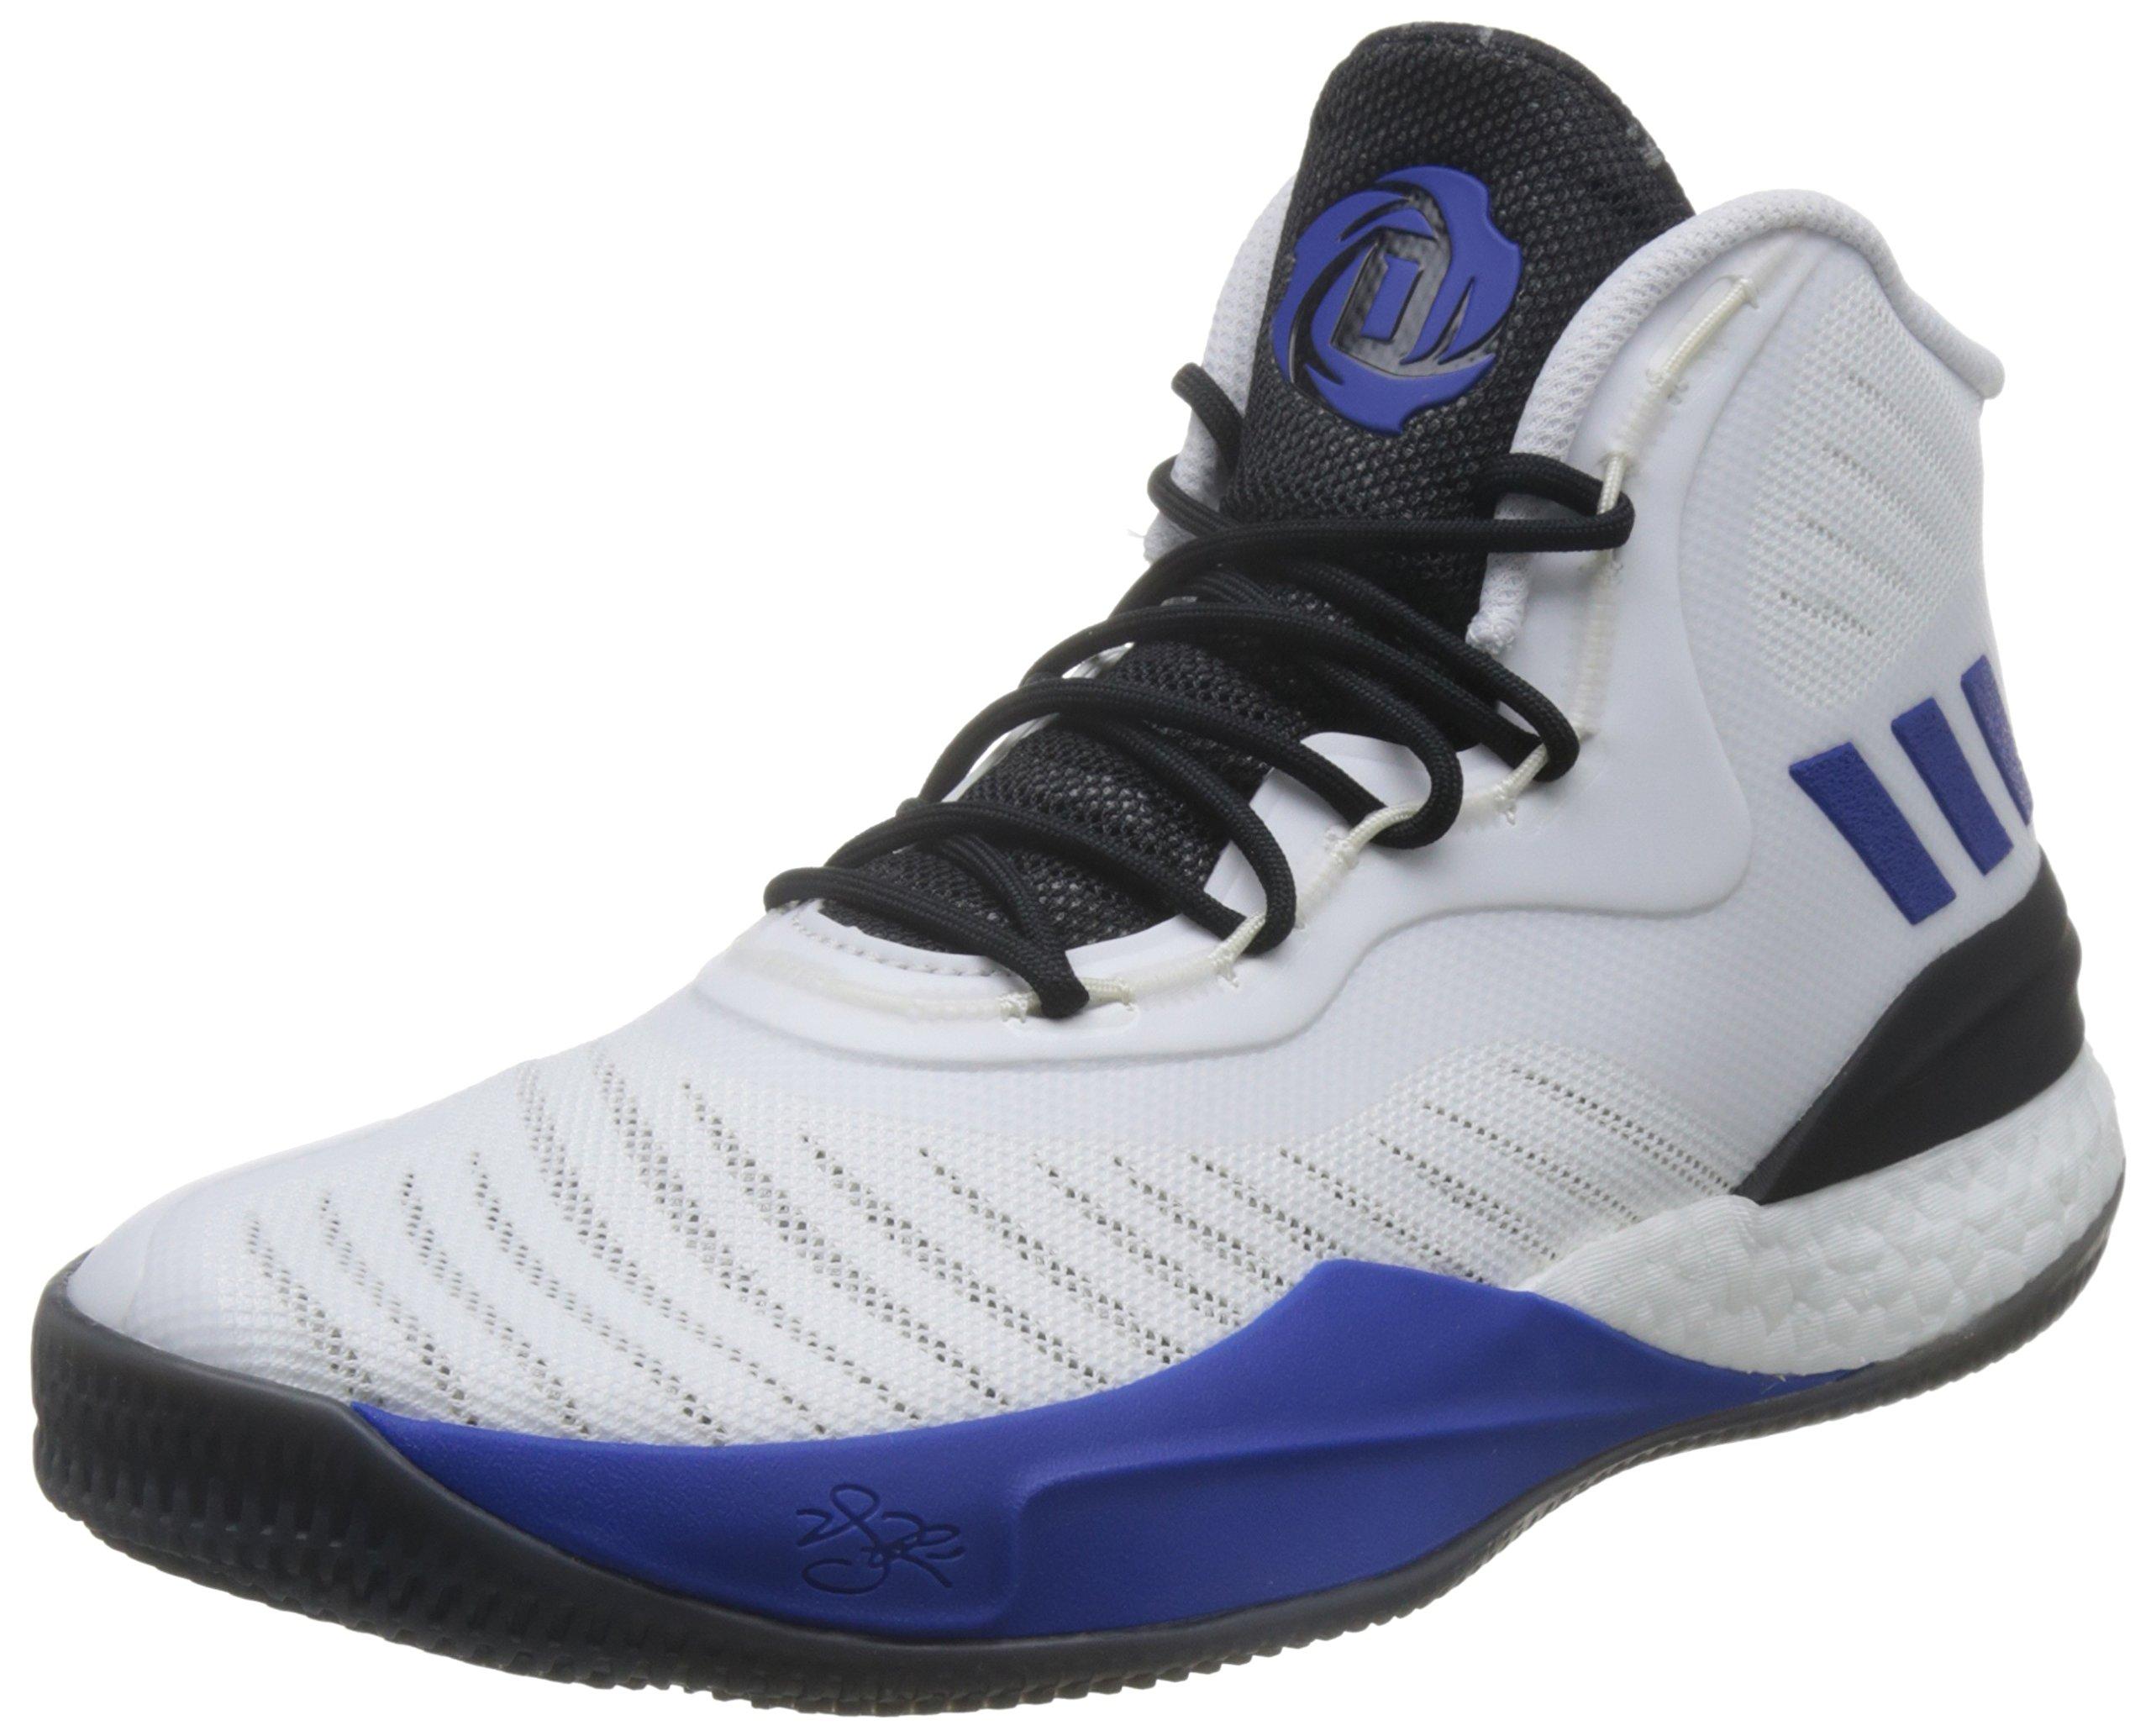 3 D Rose Black47 HommeMulticoloreftwr Adidas 8Chaussures core Eu Basketball White De 1 scarlet CerQoExBWd